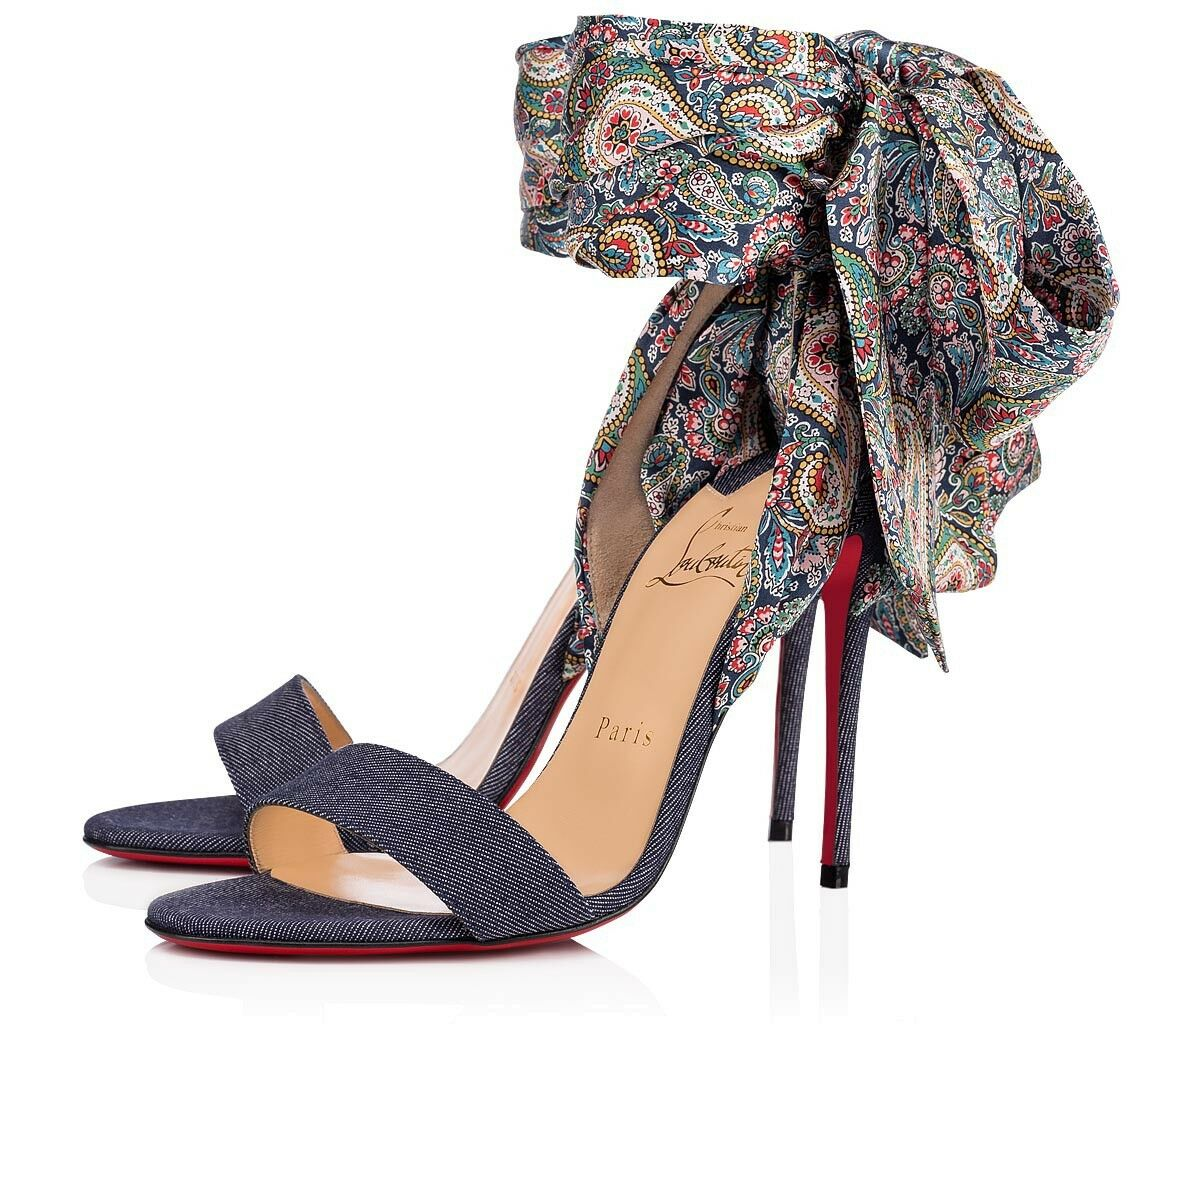 NIB Christian Louboutin Sandale Du Desert 100 bluee Lace Up Sandal Heel Pump 36.5